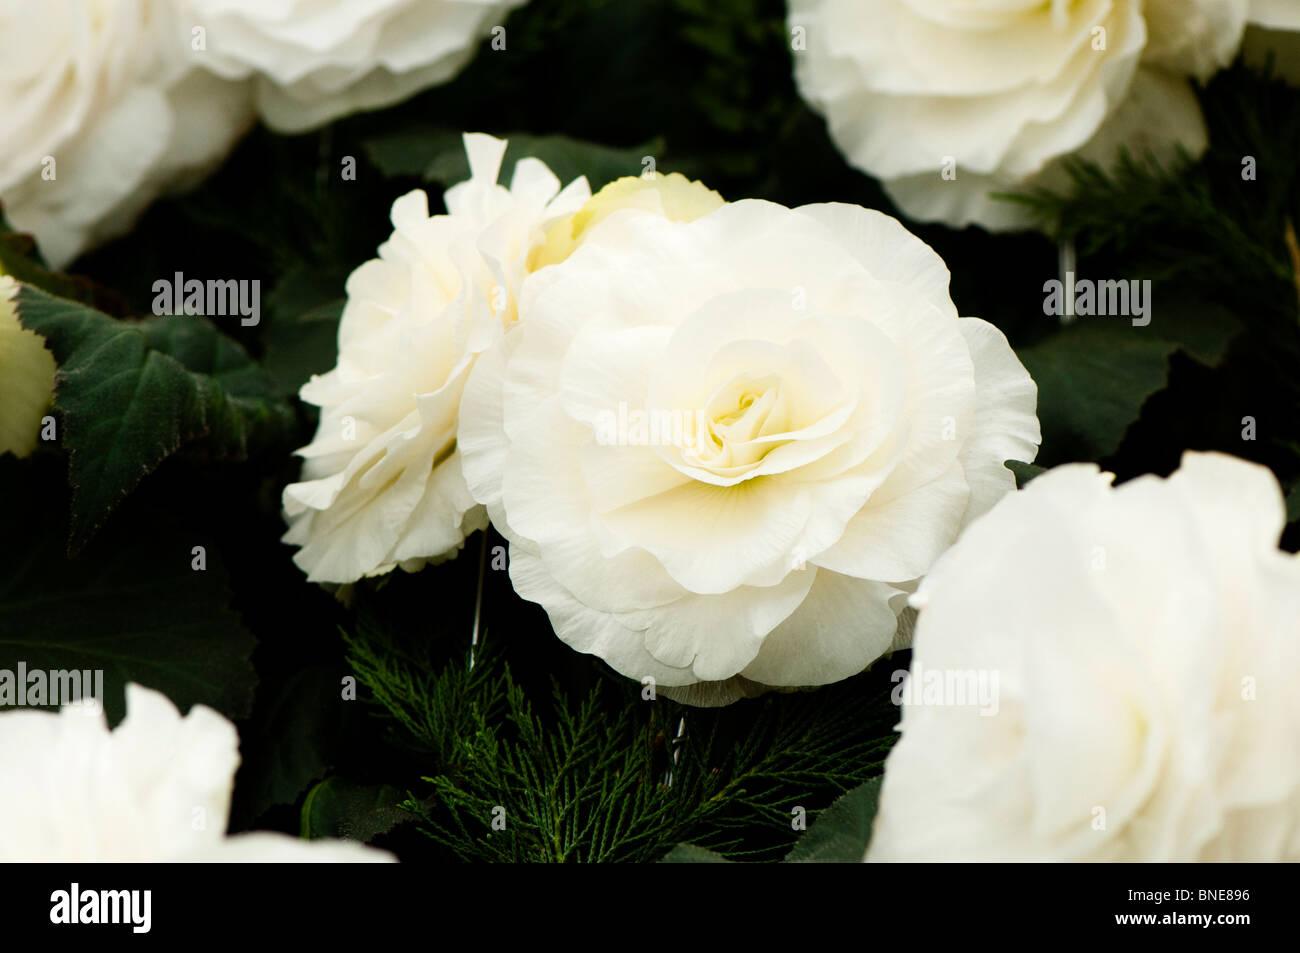 Begonia 'Billie Langdon' in flower - Stock Image